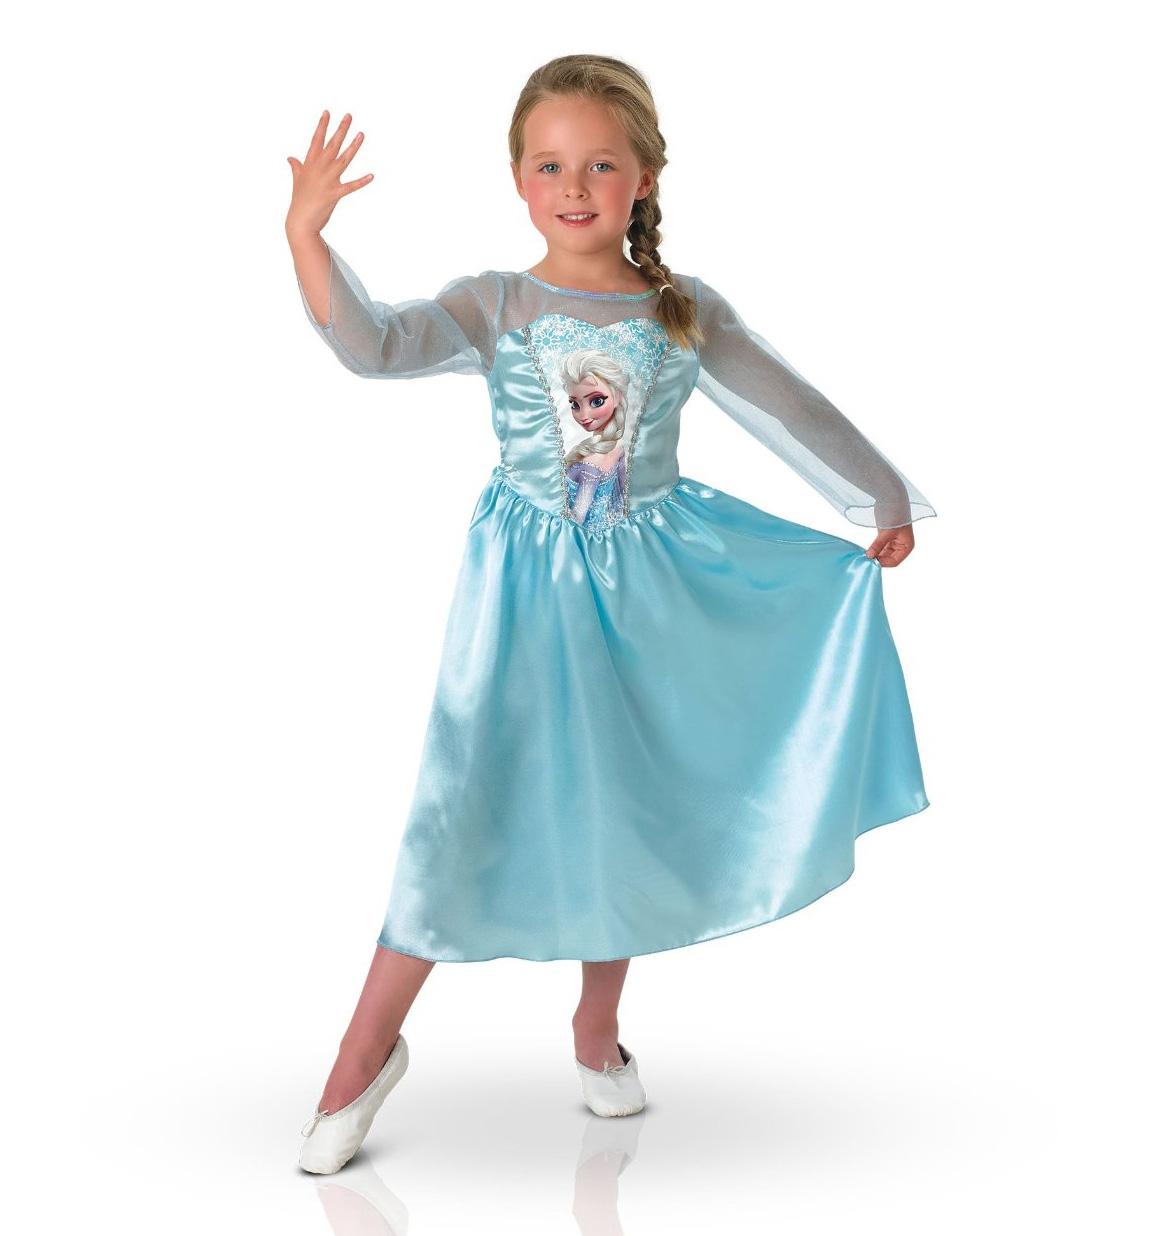 GIRLS/FAIRYTALE/ Frozen, Elsa (Snow Queen) (child) classic